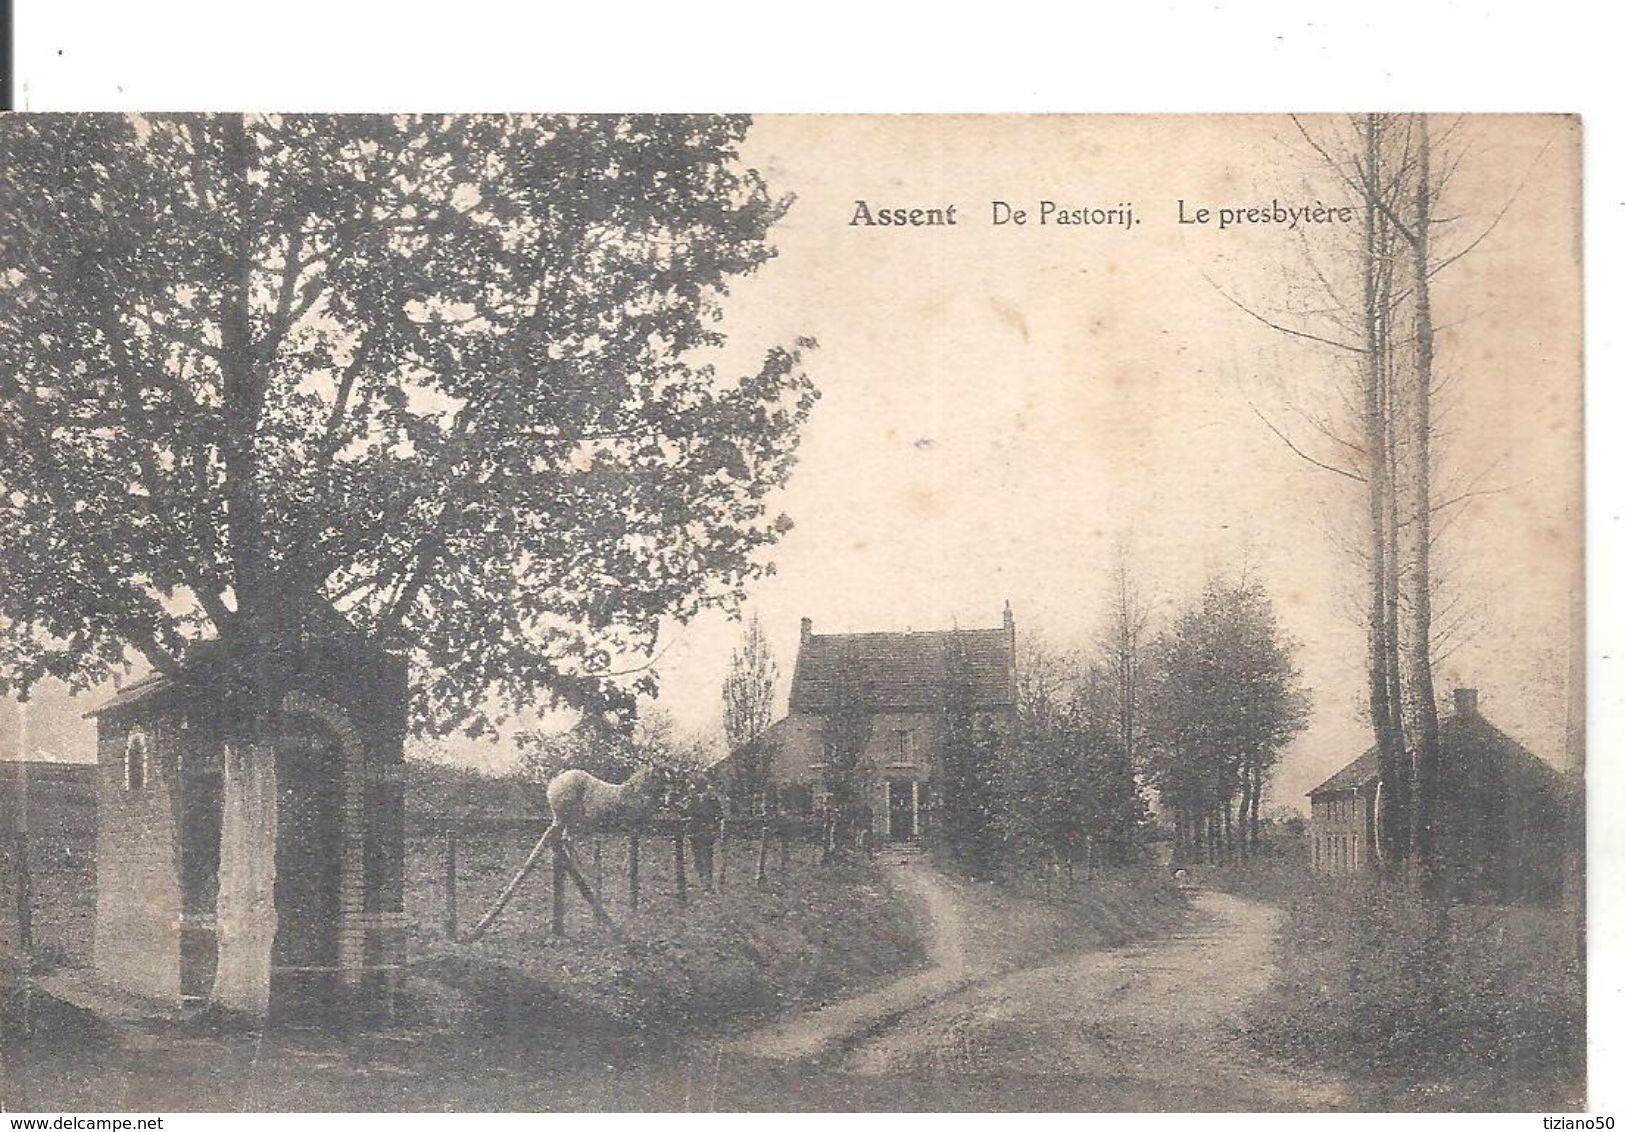 ASSENT,DE PASTORIJ.viaggiata 1934.fp.4821 - België